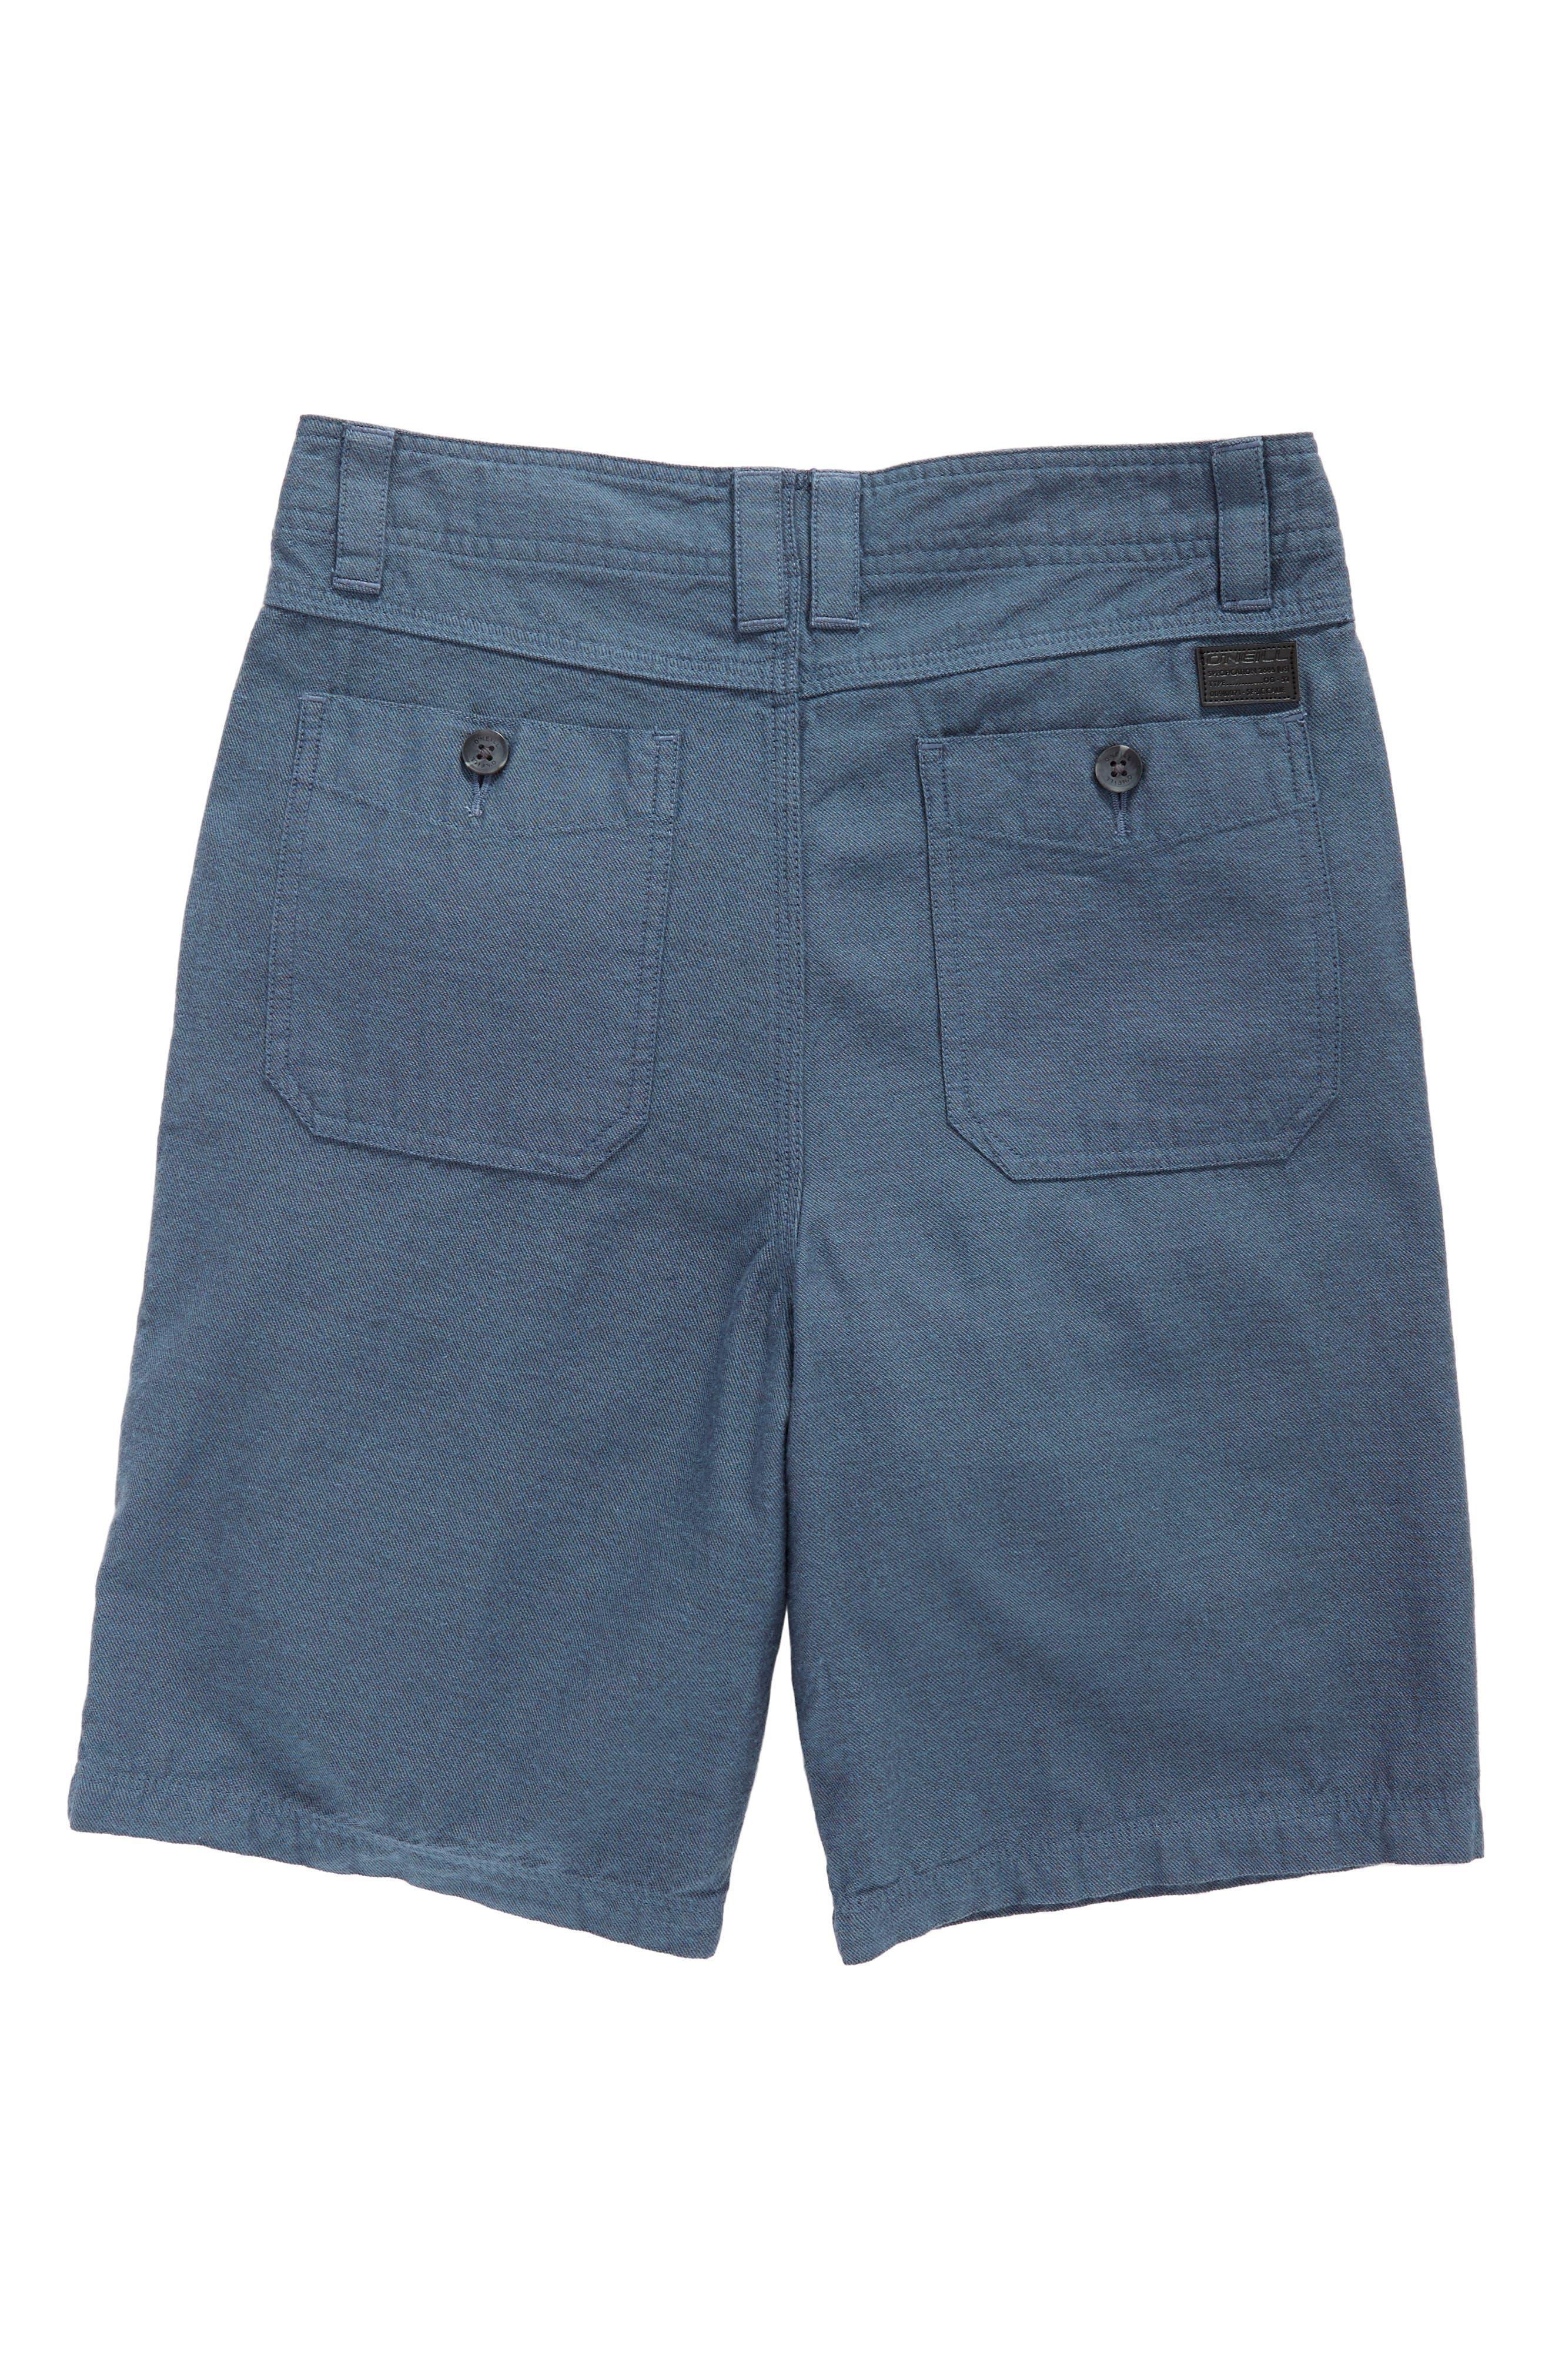 Scranton Chino Shorts,                             Alternate thumbnail 2, color,                             Slate